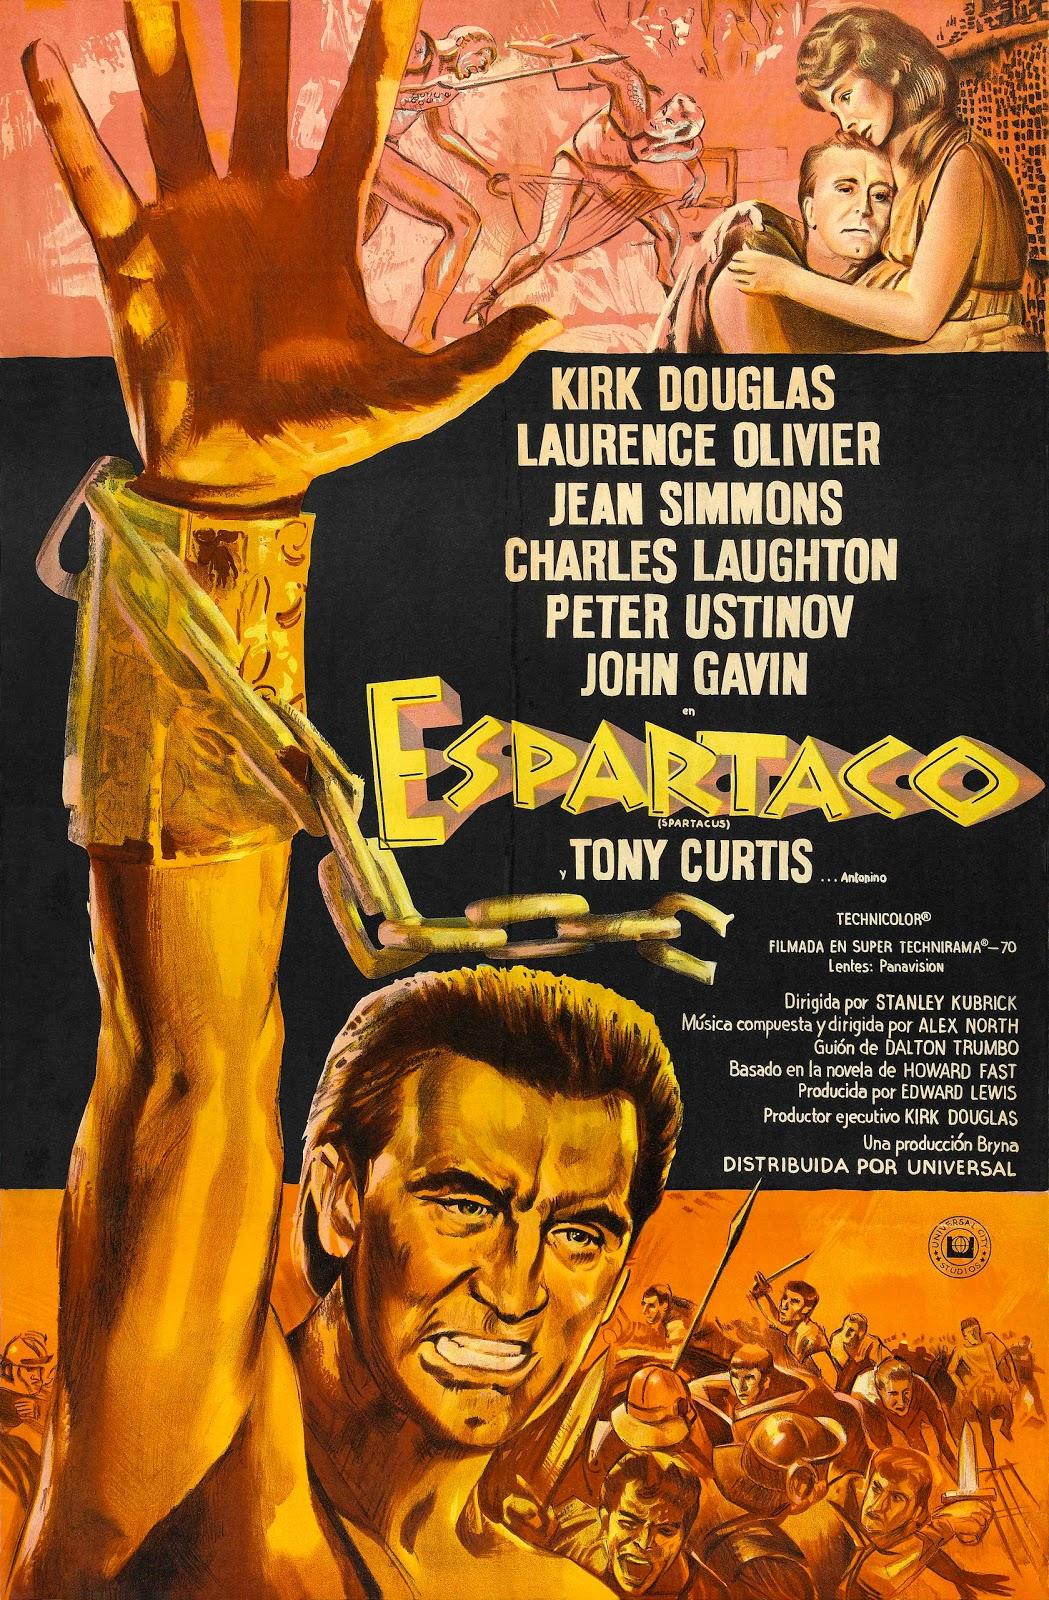 Filme Spartacus throughout o rato cinéfilo: spartacus (1960)